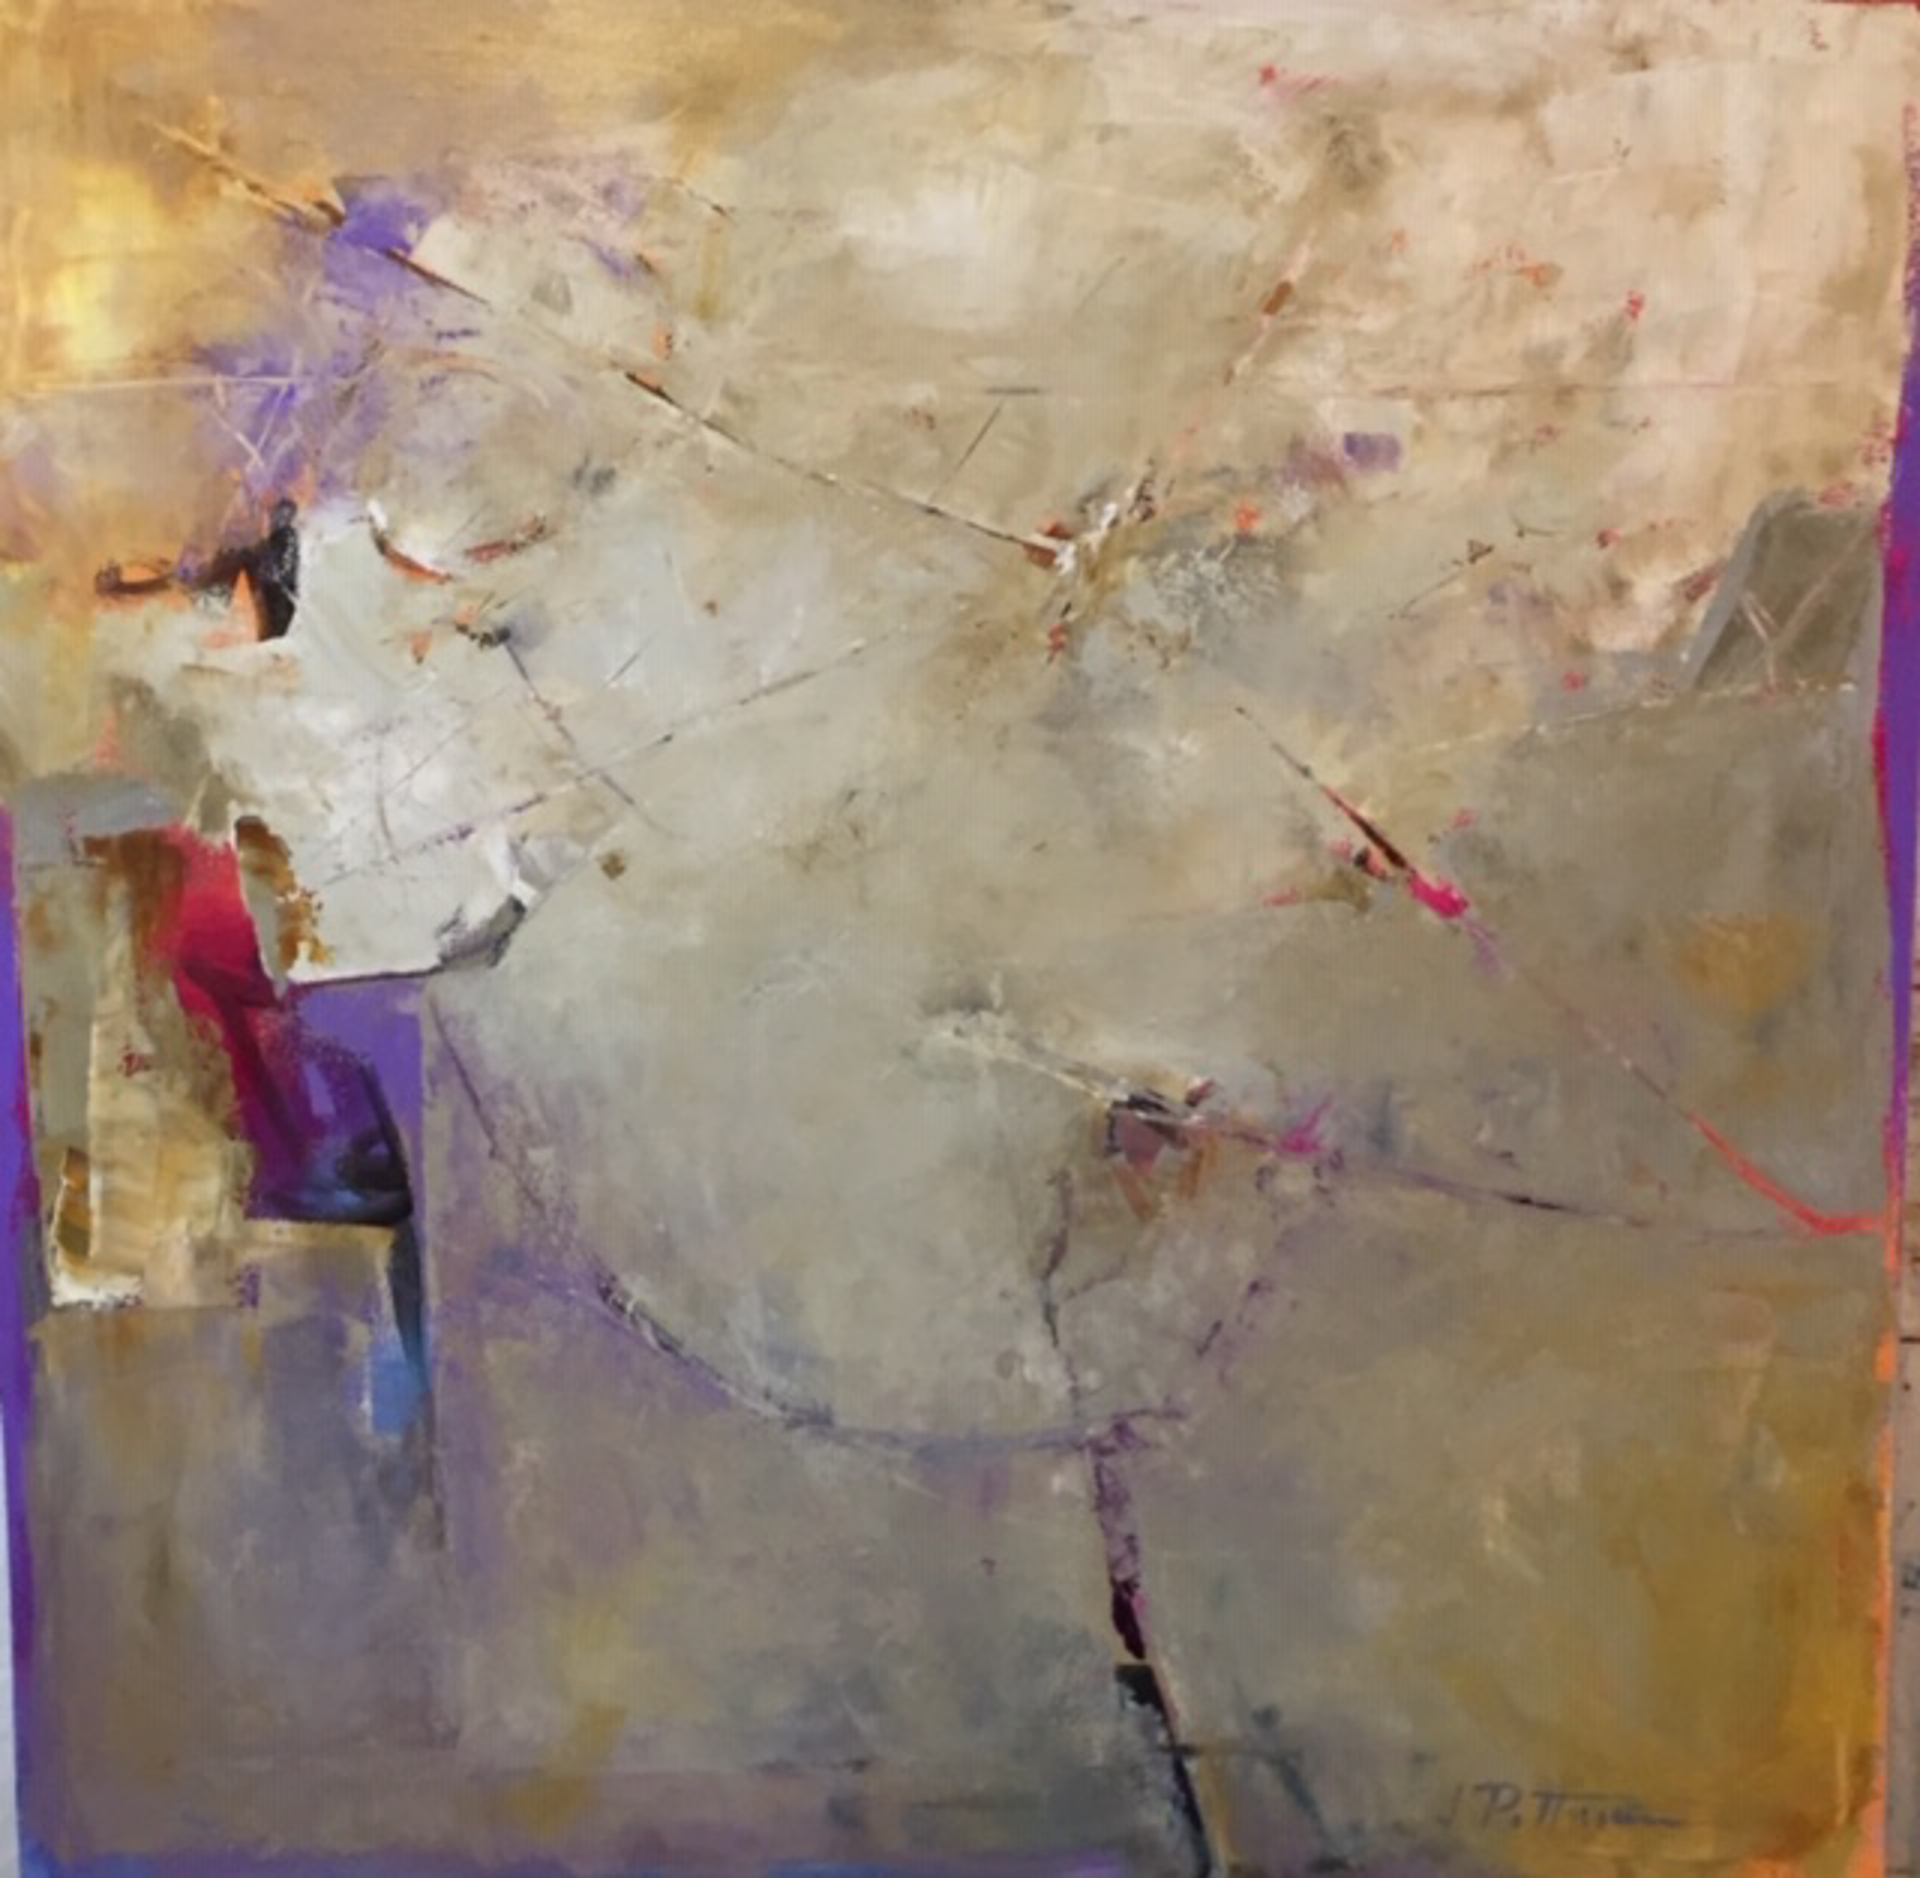 Tide Marks 1 by Jim Pittman